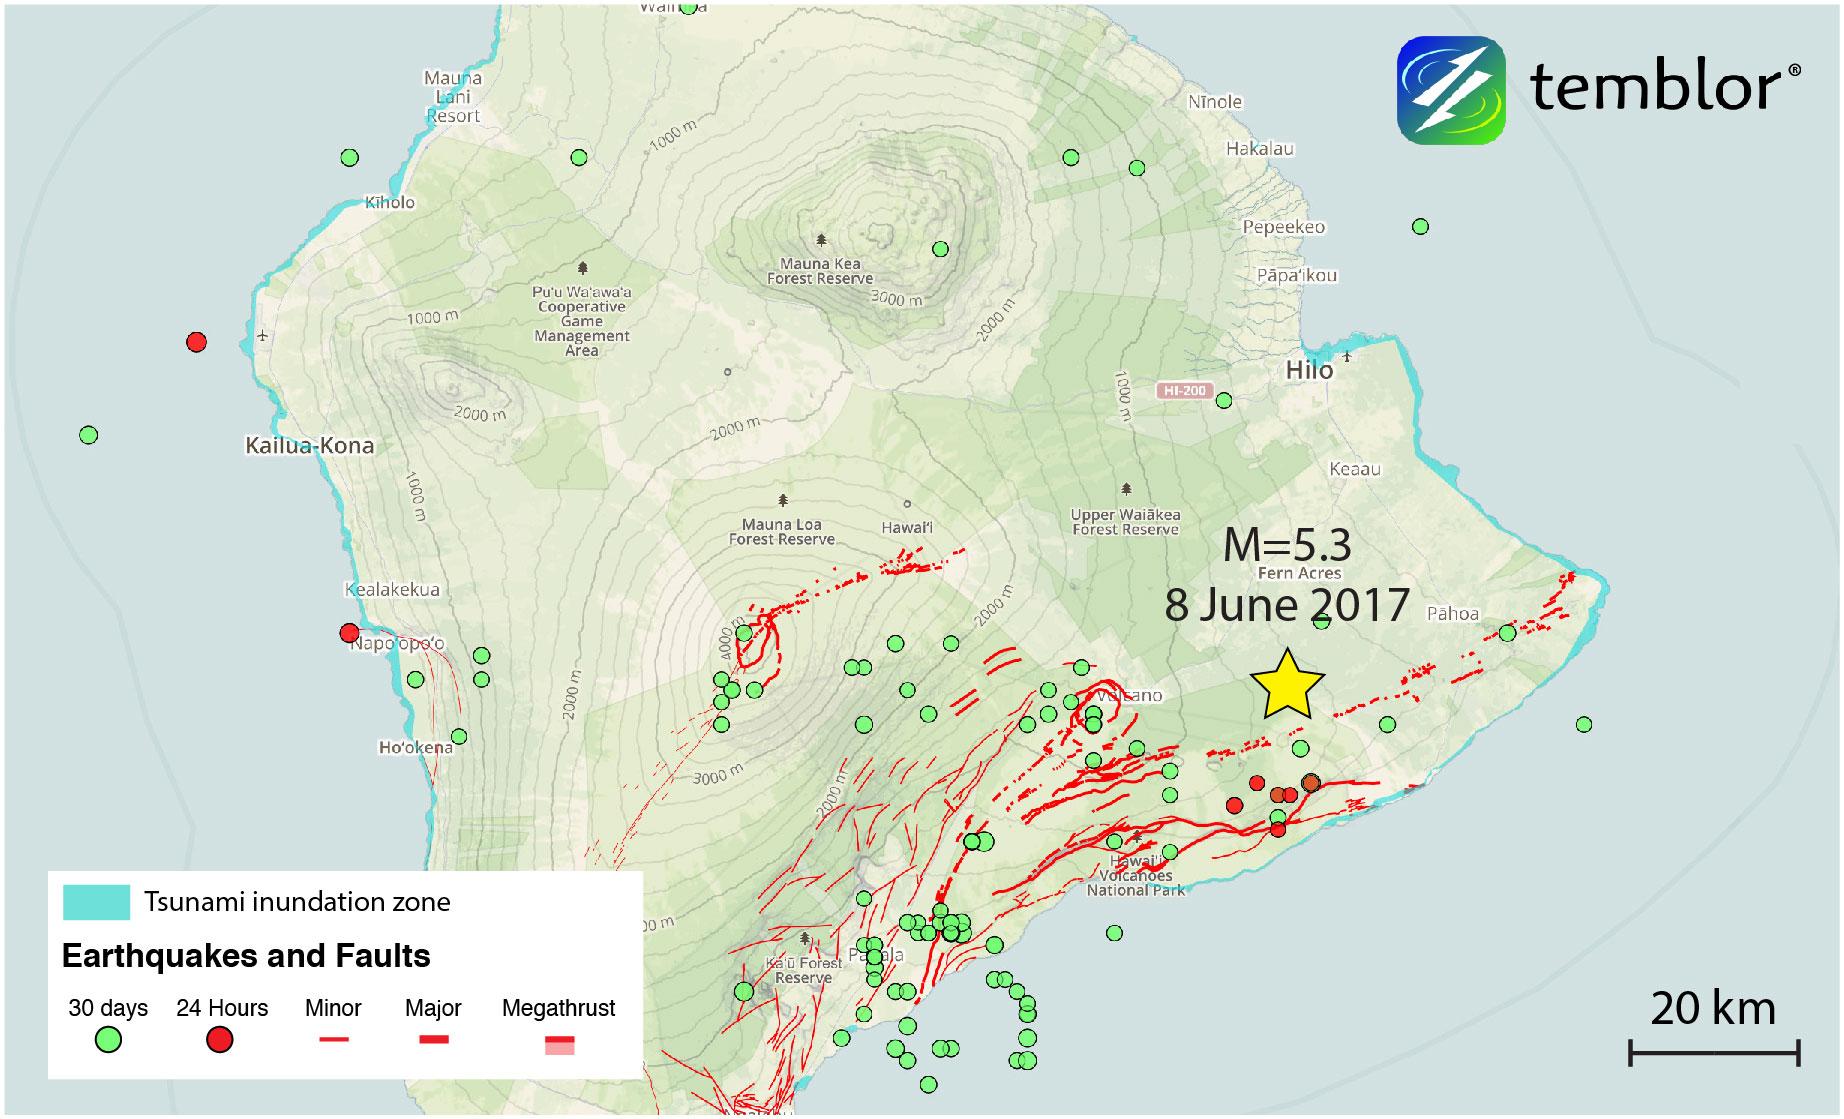 big-island-hawaii-tsunami-inundation-zone-map